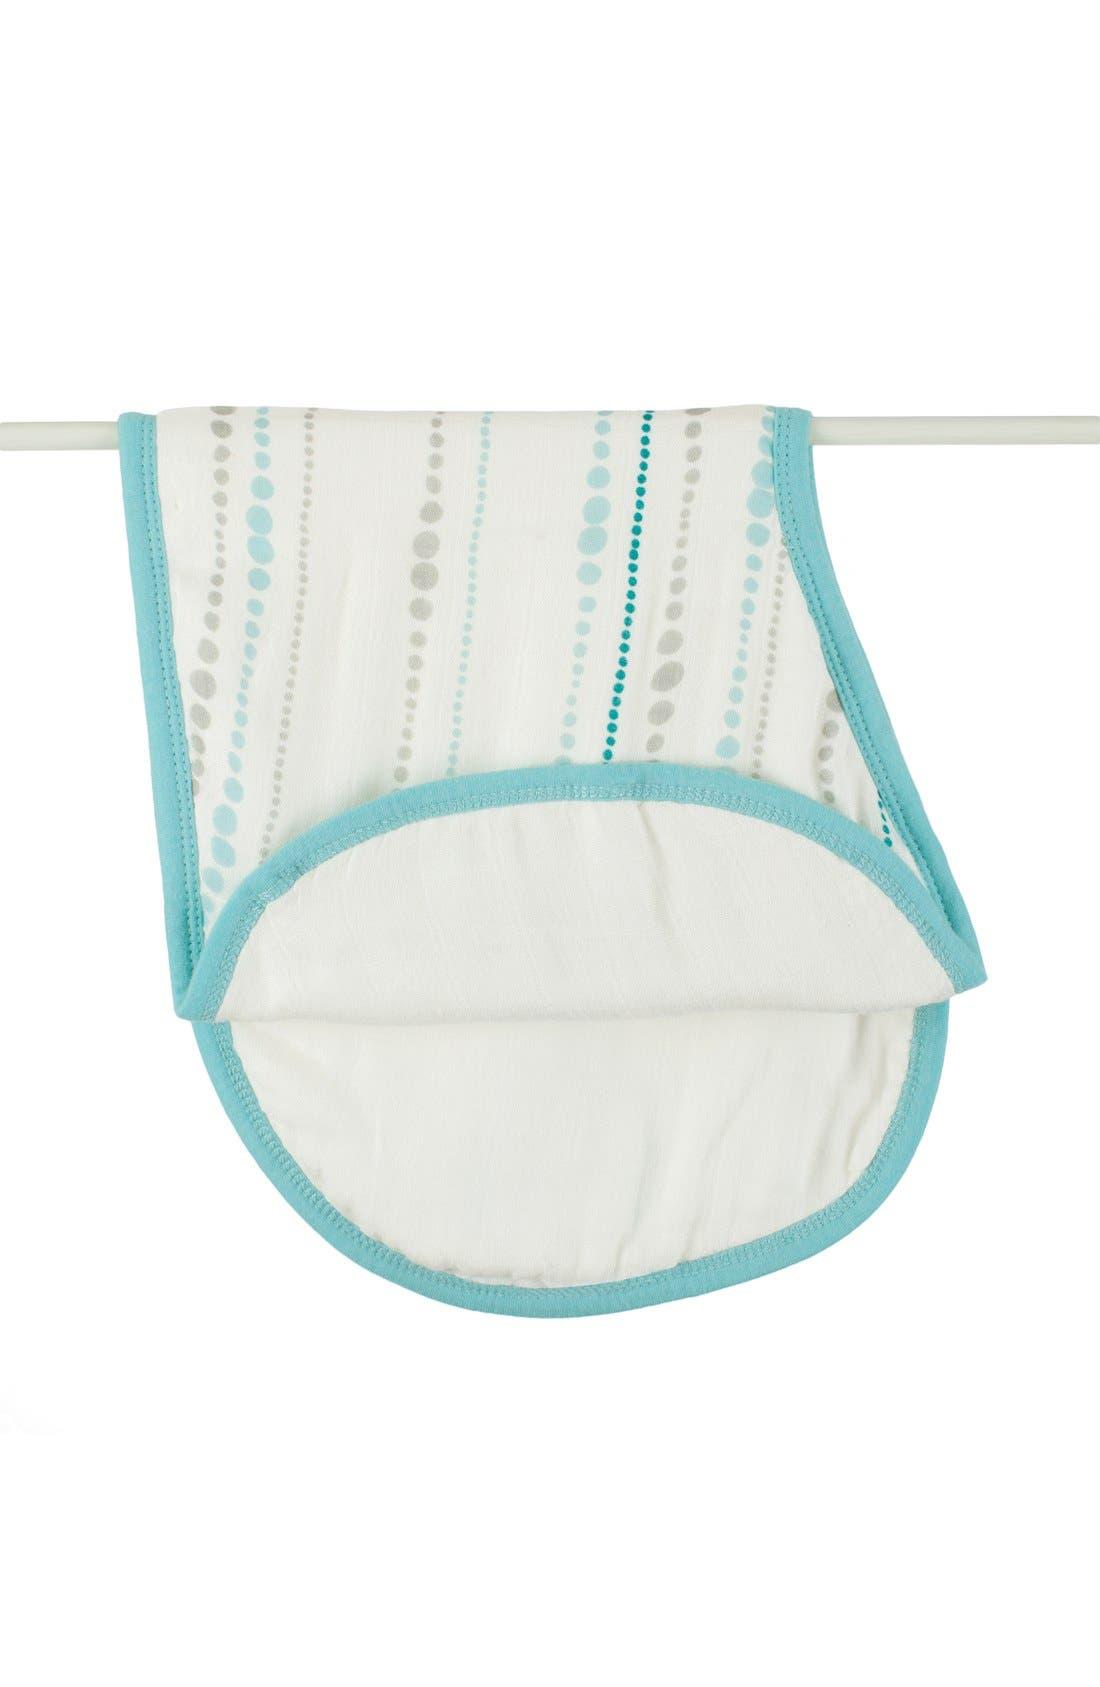 Main Image - aden + anais Burpy Bib® Burp Cloth & Bib